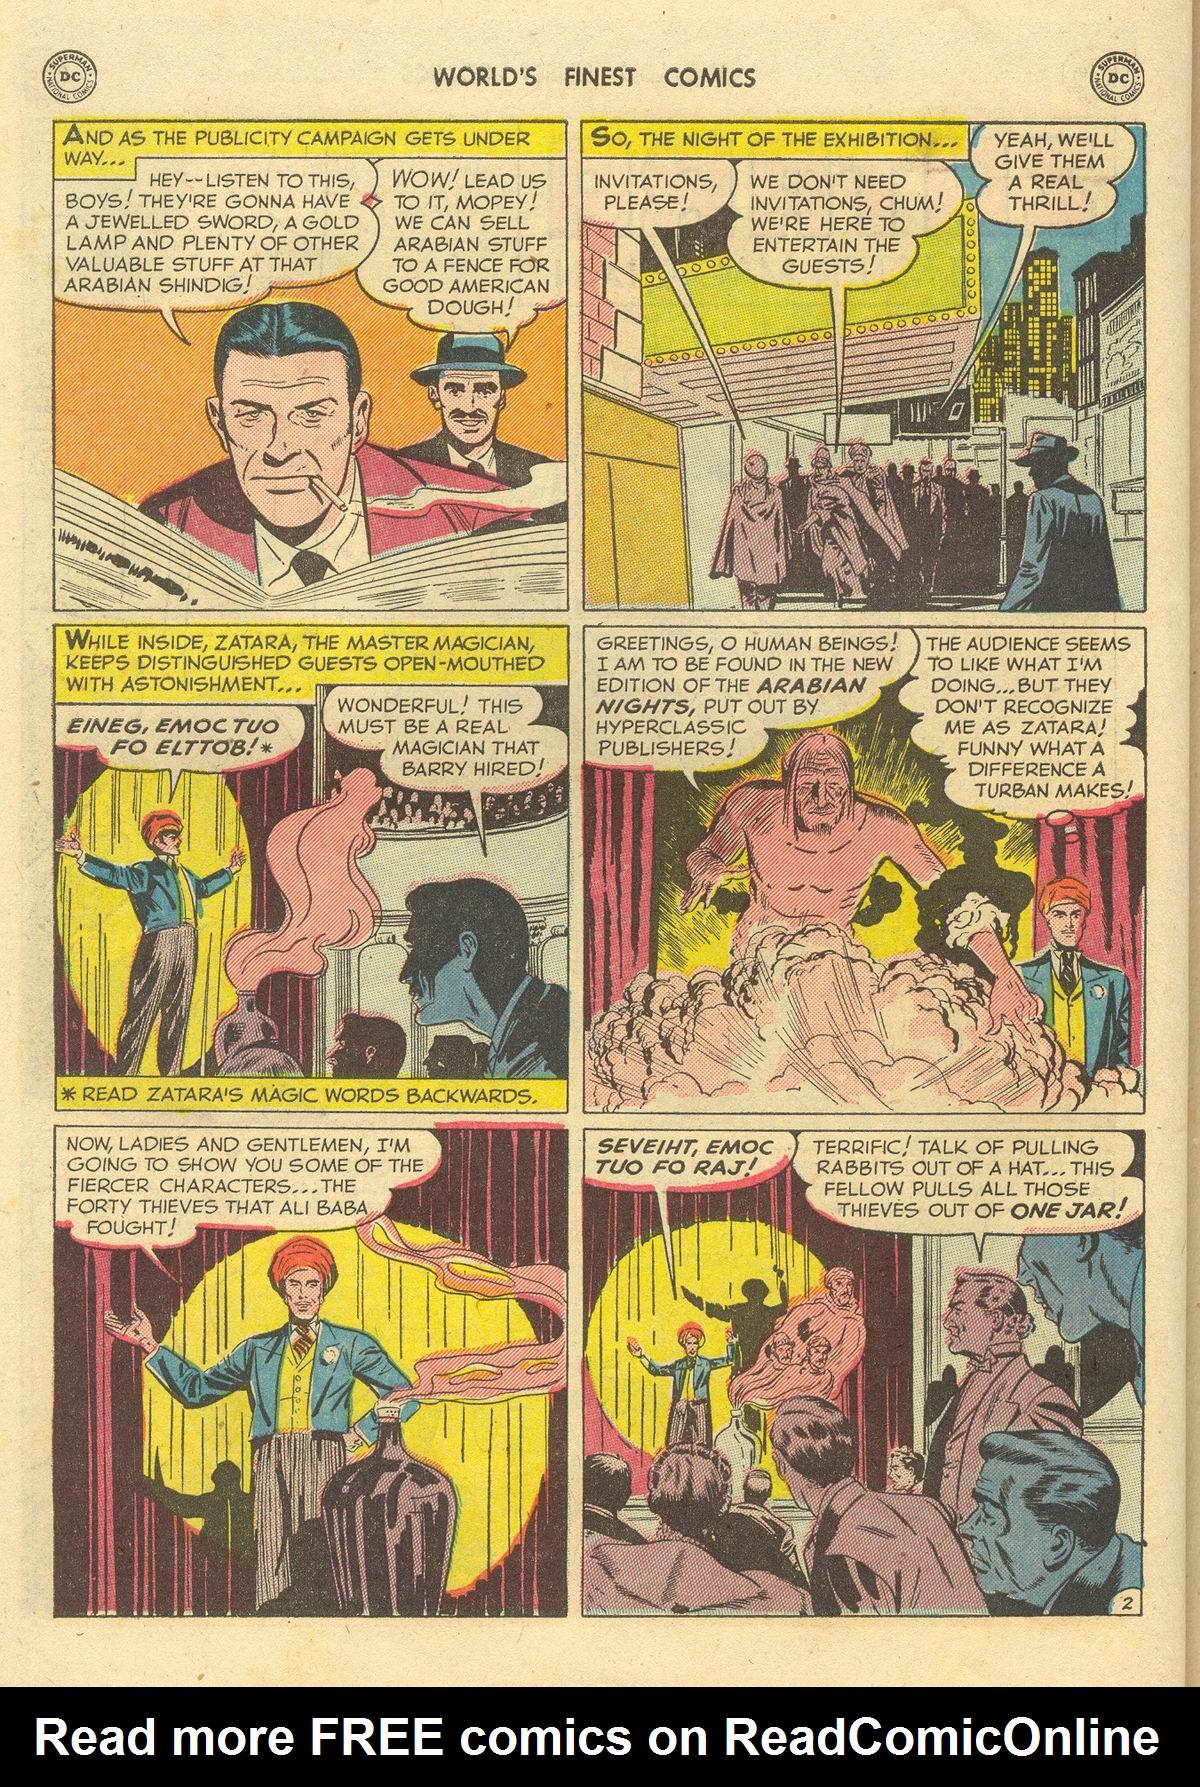 Read online World's Finest Comics comic -  Issue #51 - 56